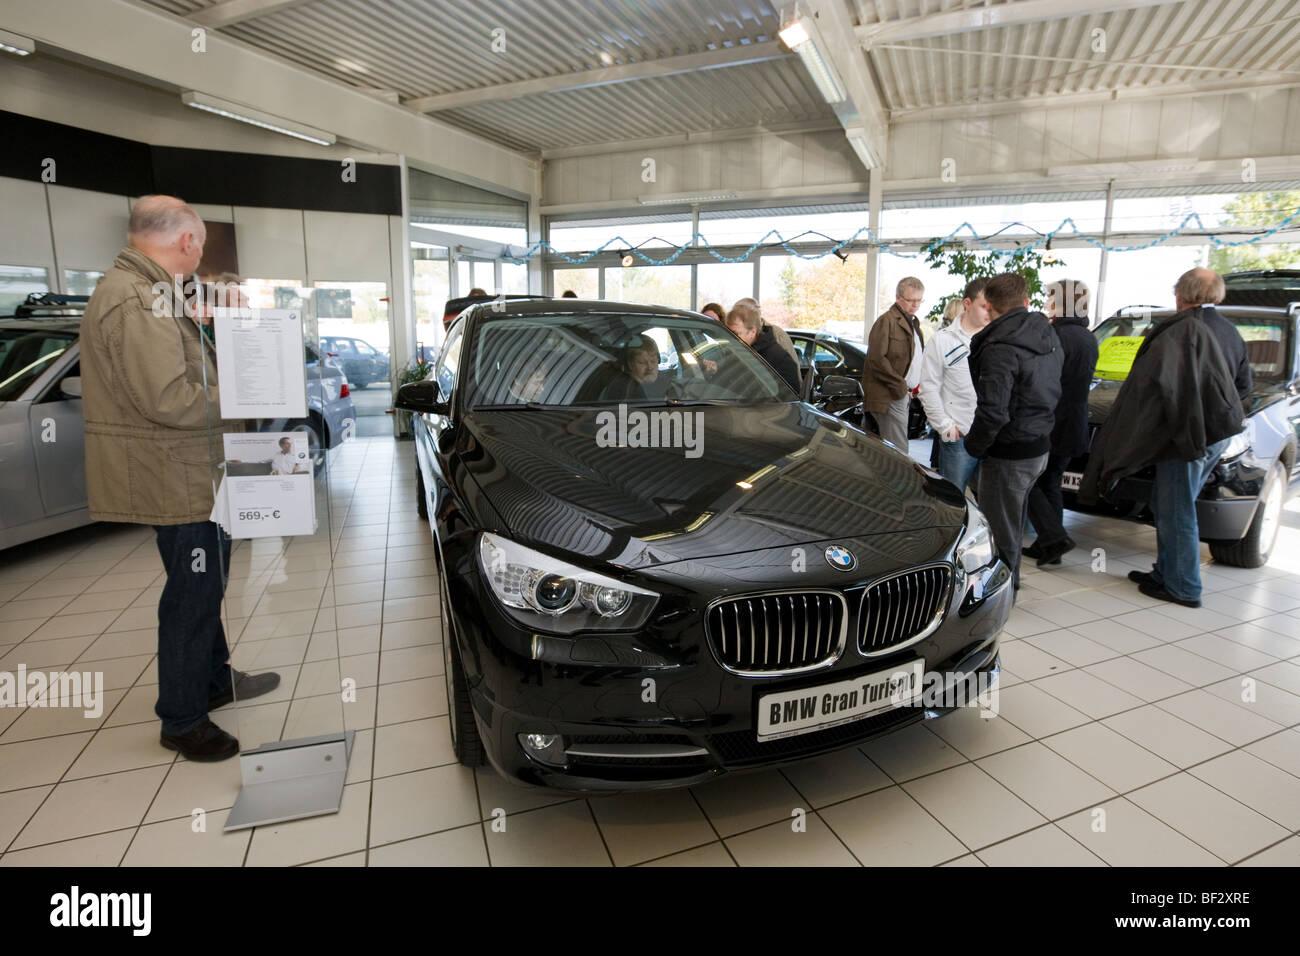 BMW 5 series Gran Turismo presentation at german car dealership - Stock Image